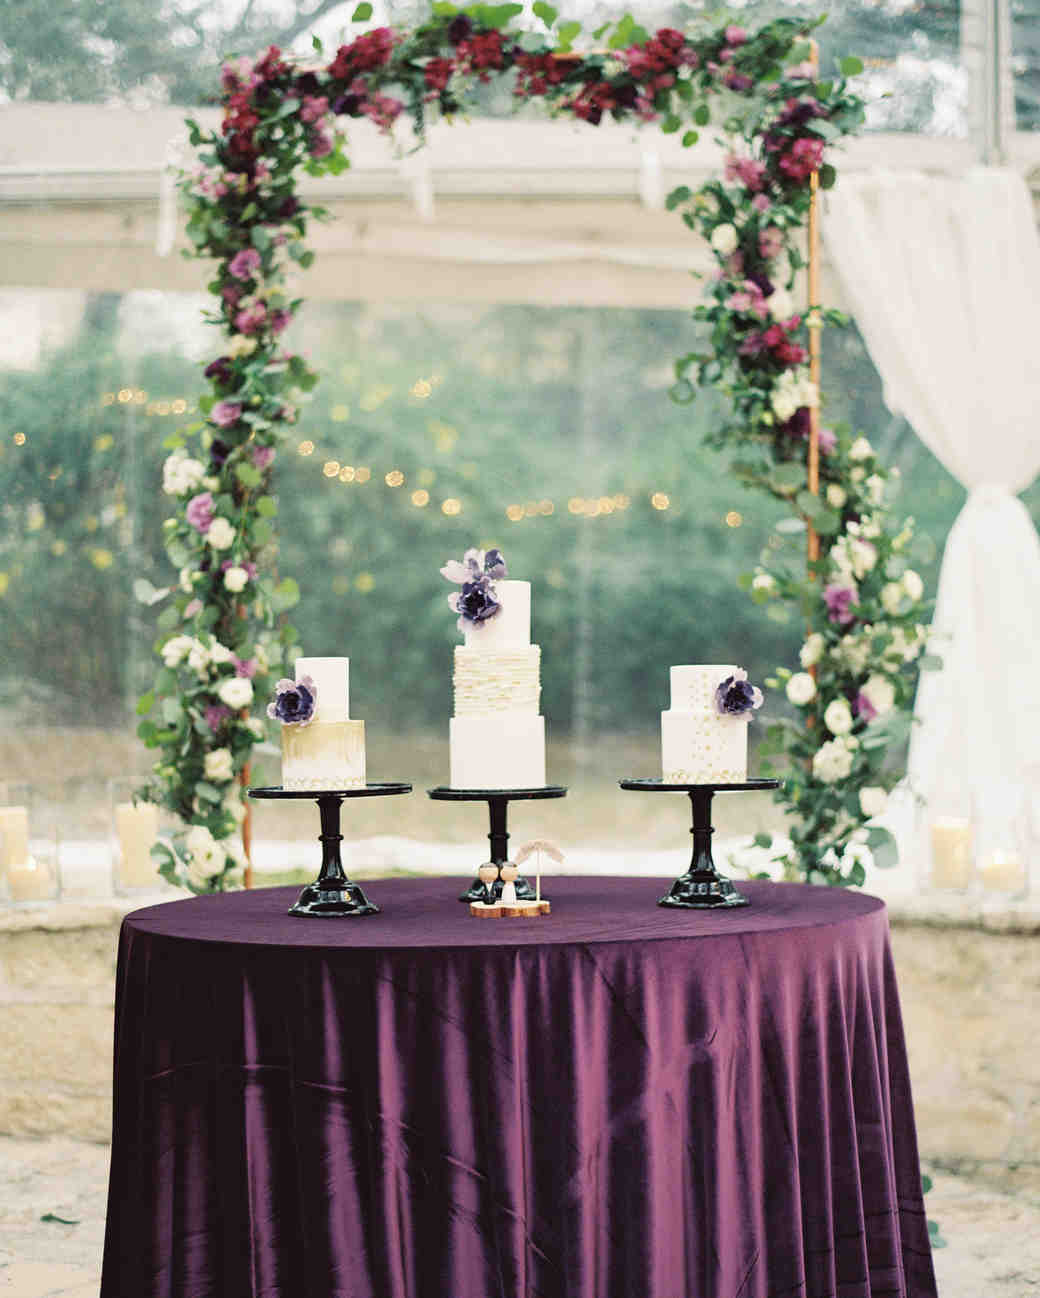 stacey-adam-wedding-cakes-0069-s112112-0815.jpg